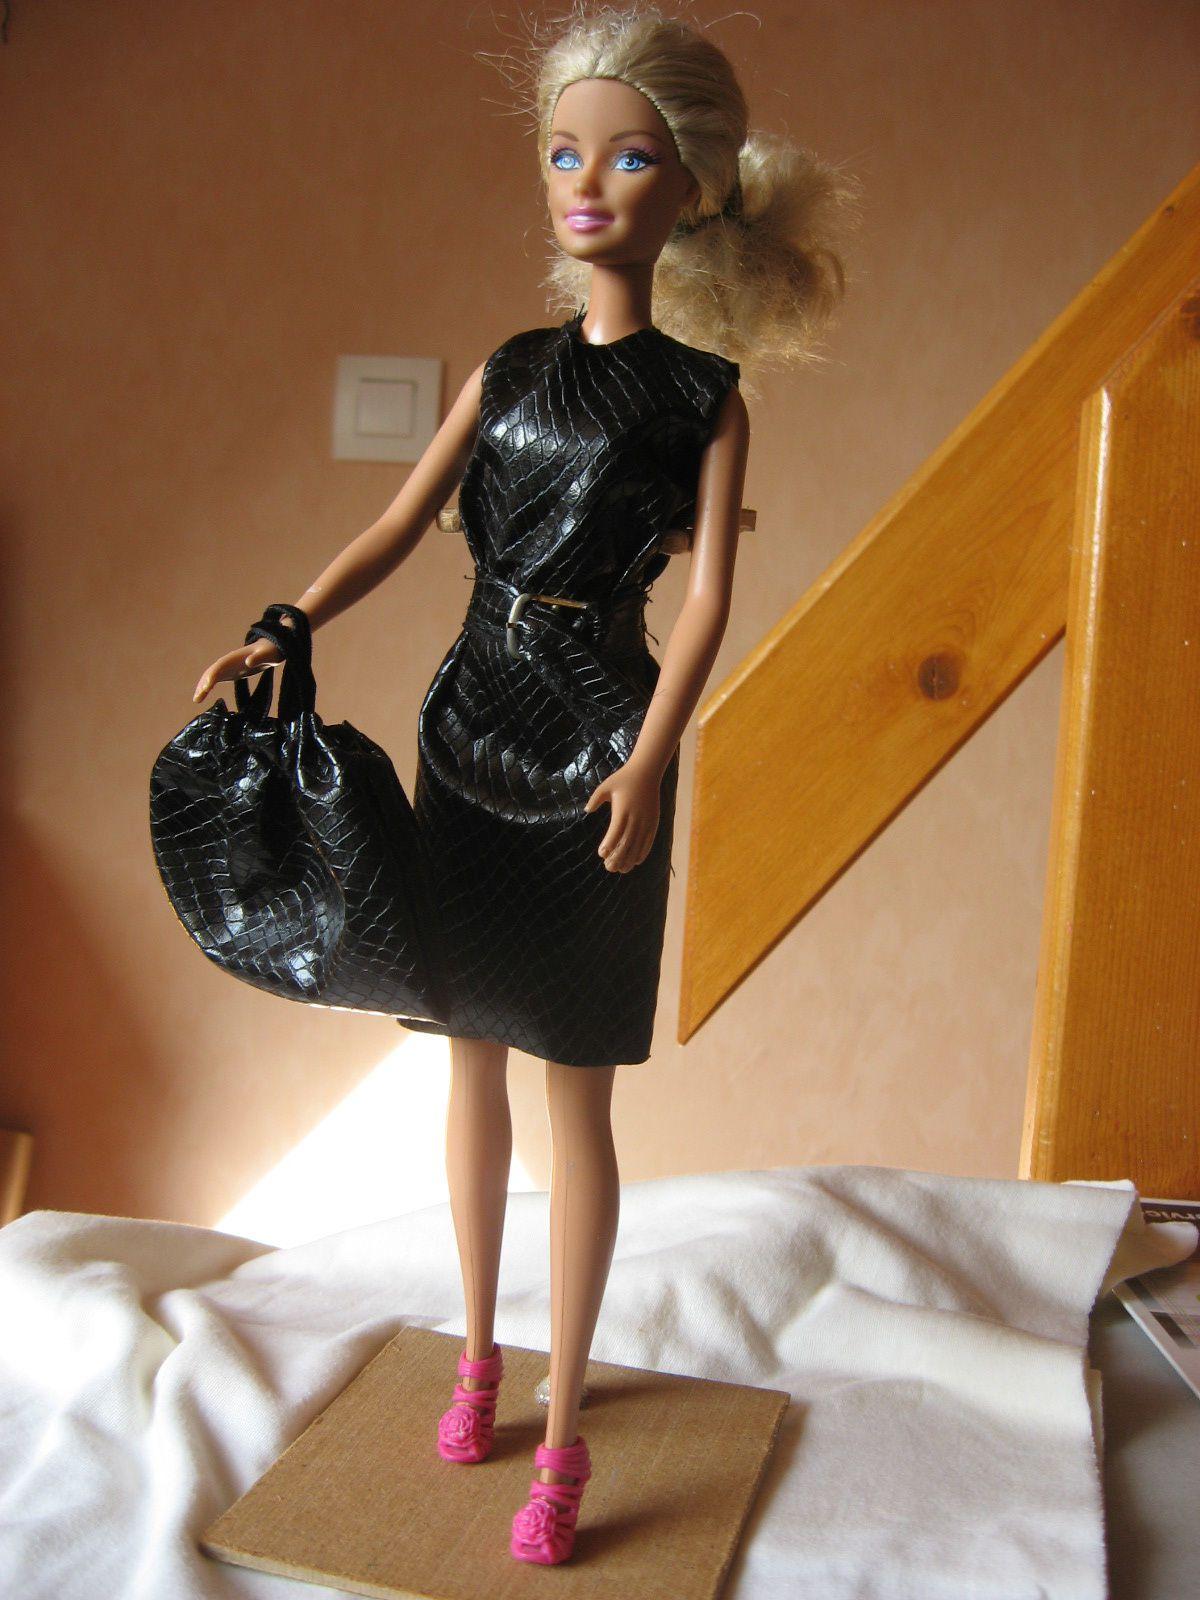 Robe cintrée noire imitation serpent Barbie sac assortivêteùe,t